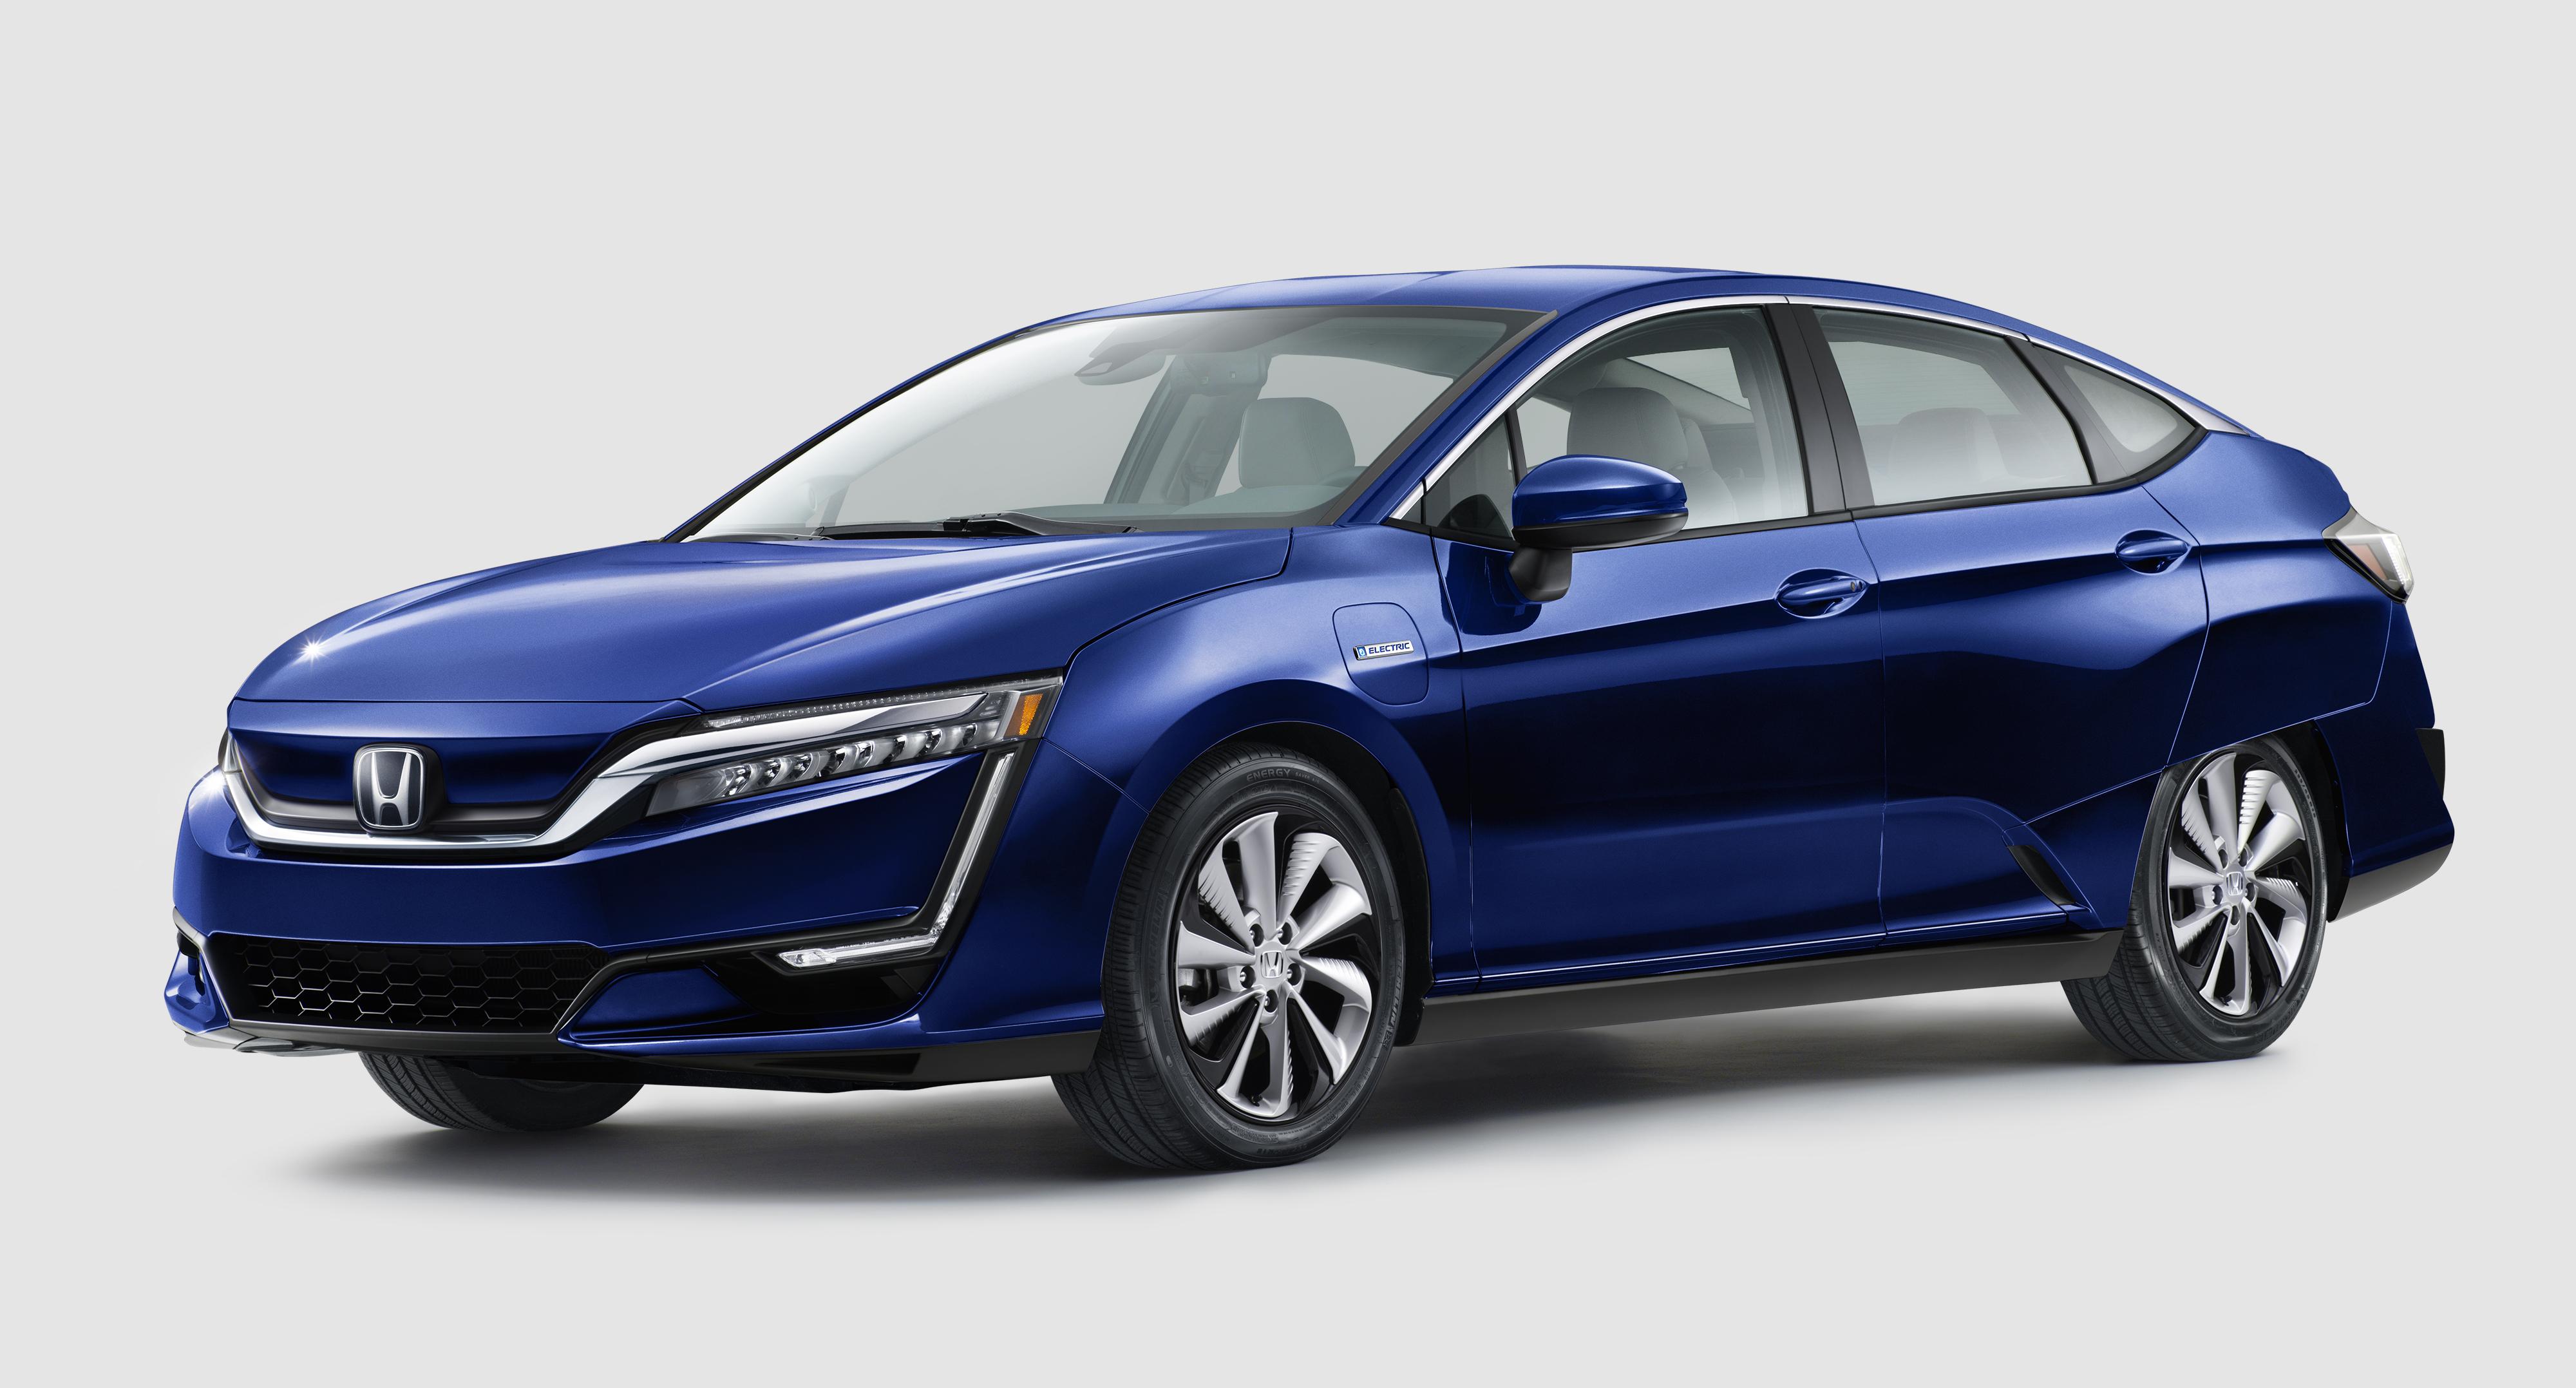 A blue Honda Clarity Electric, a midsize sedan.